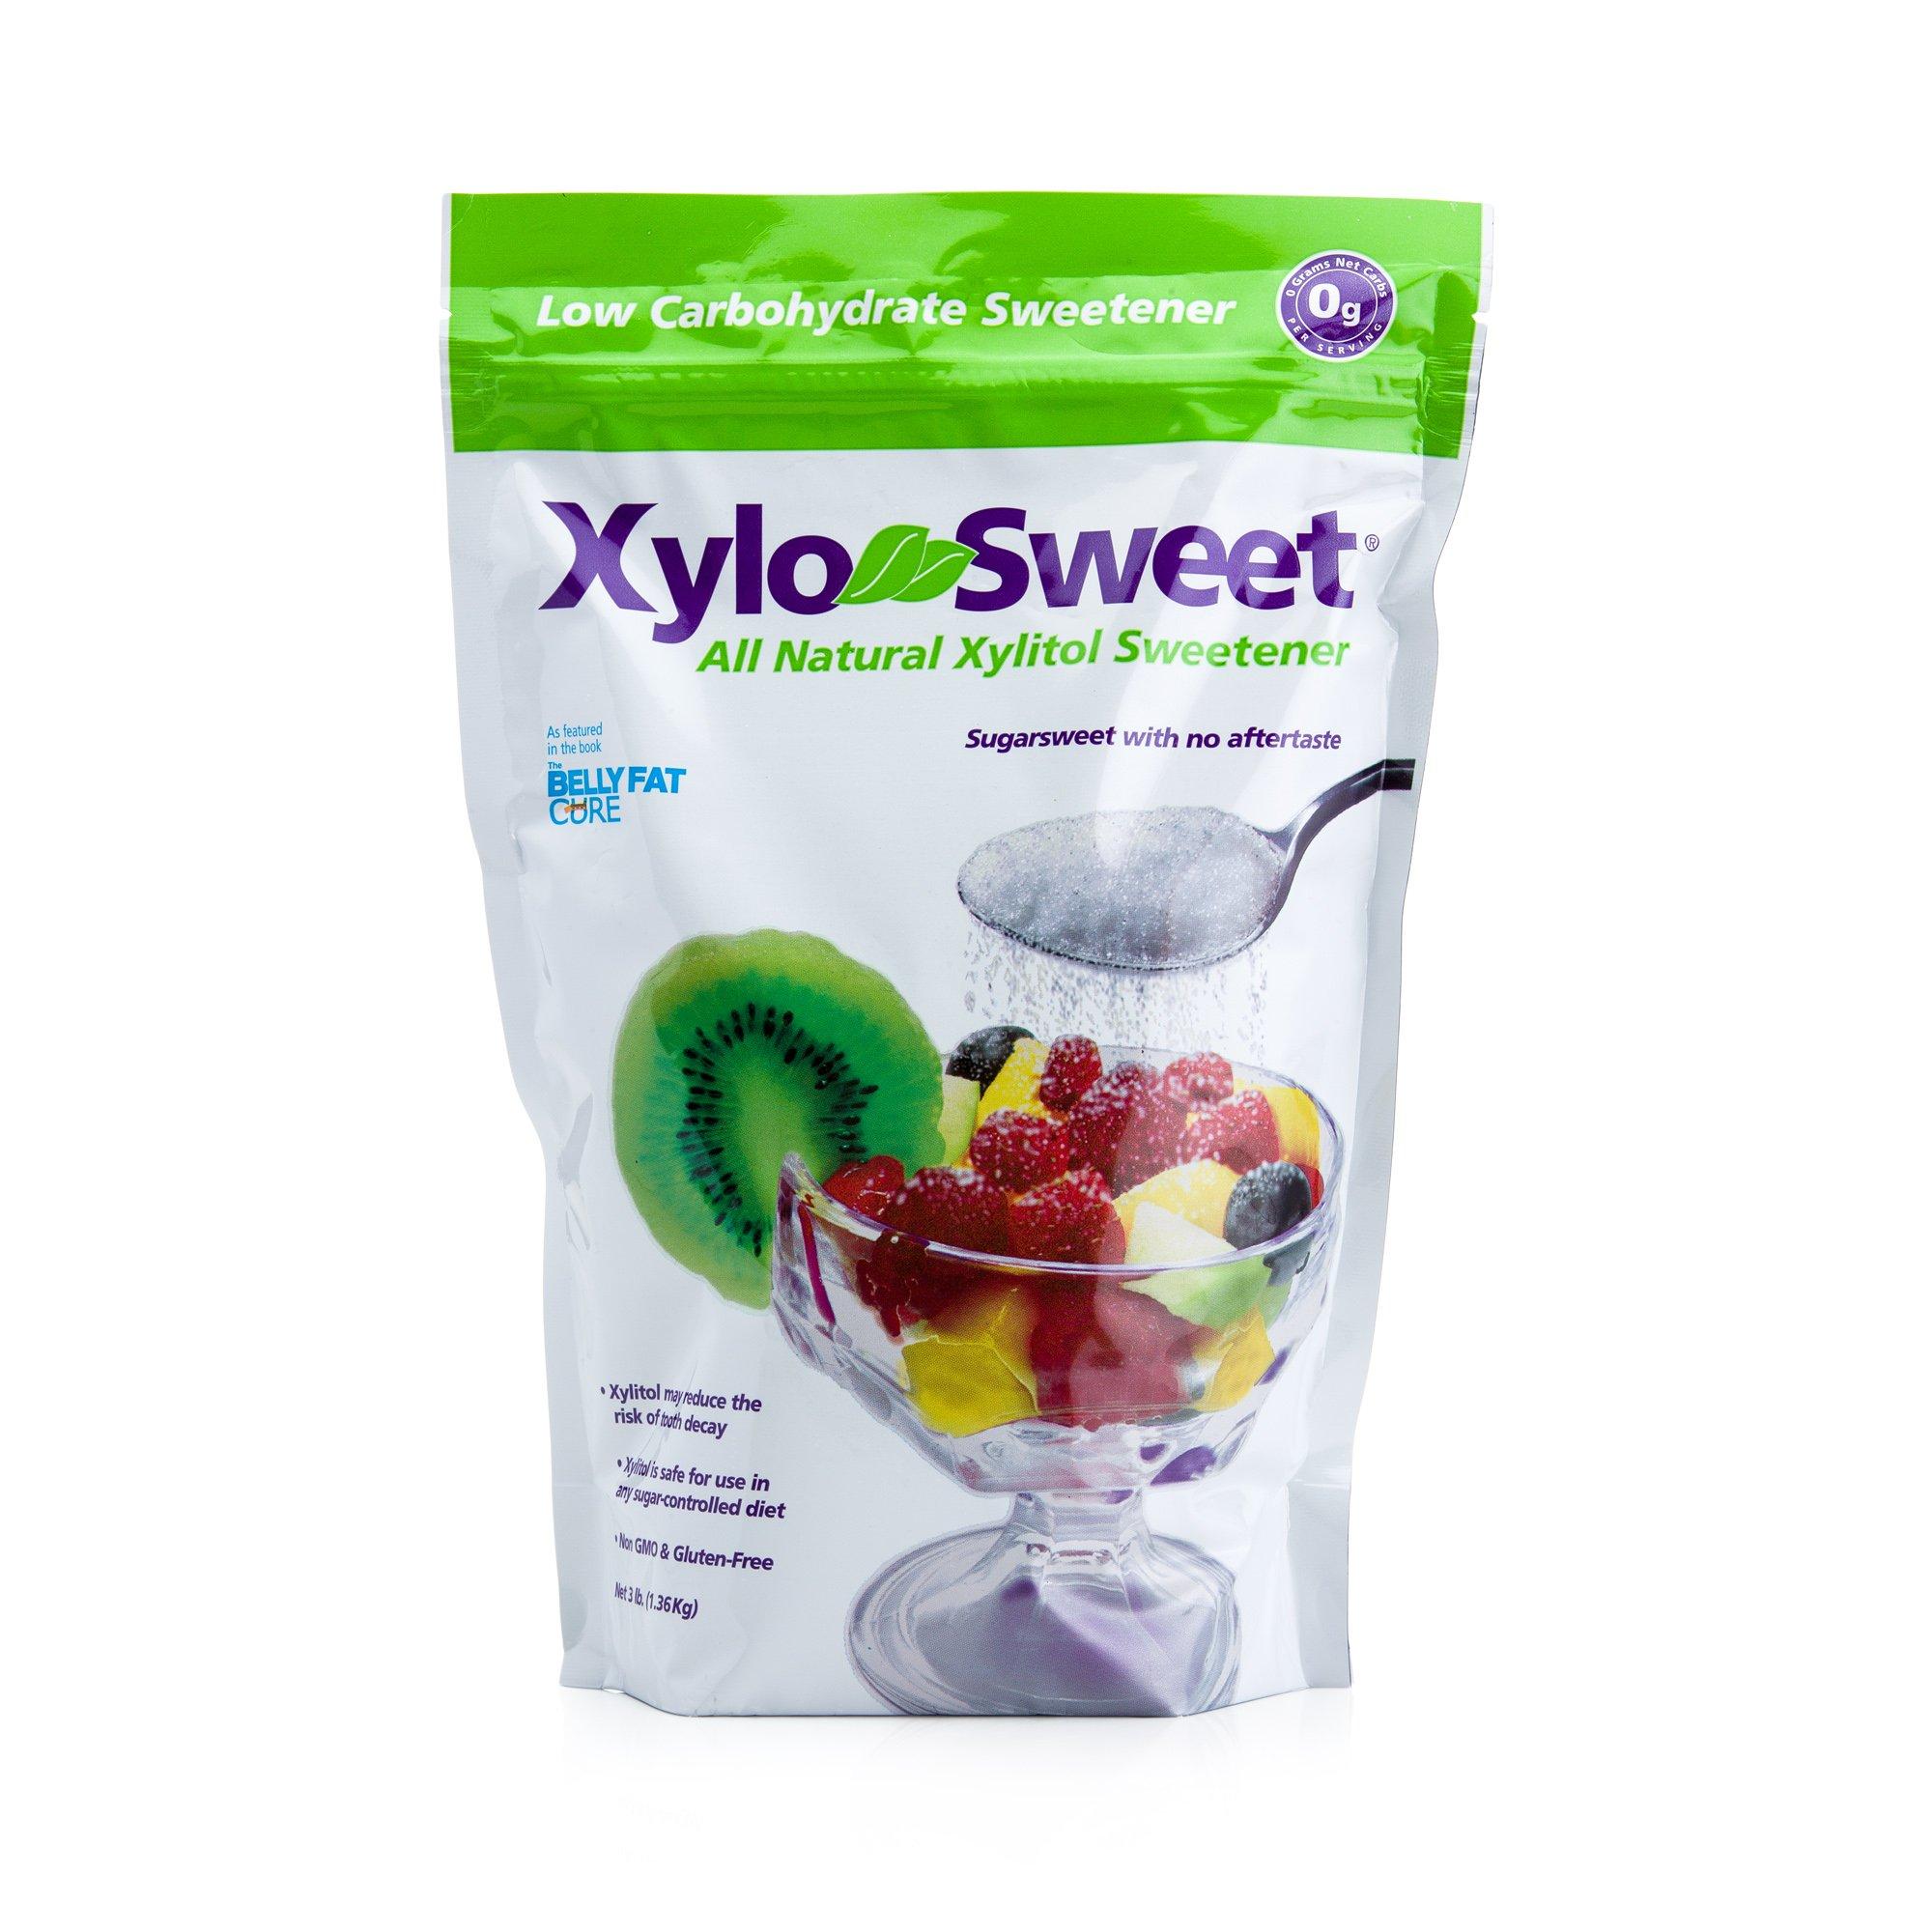 Xlear XyloSweet Xylitol Sweetener - 3lb Bag